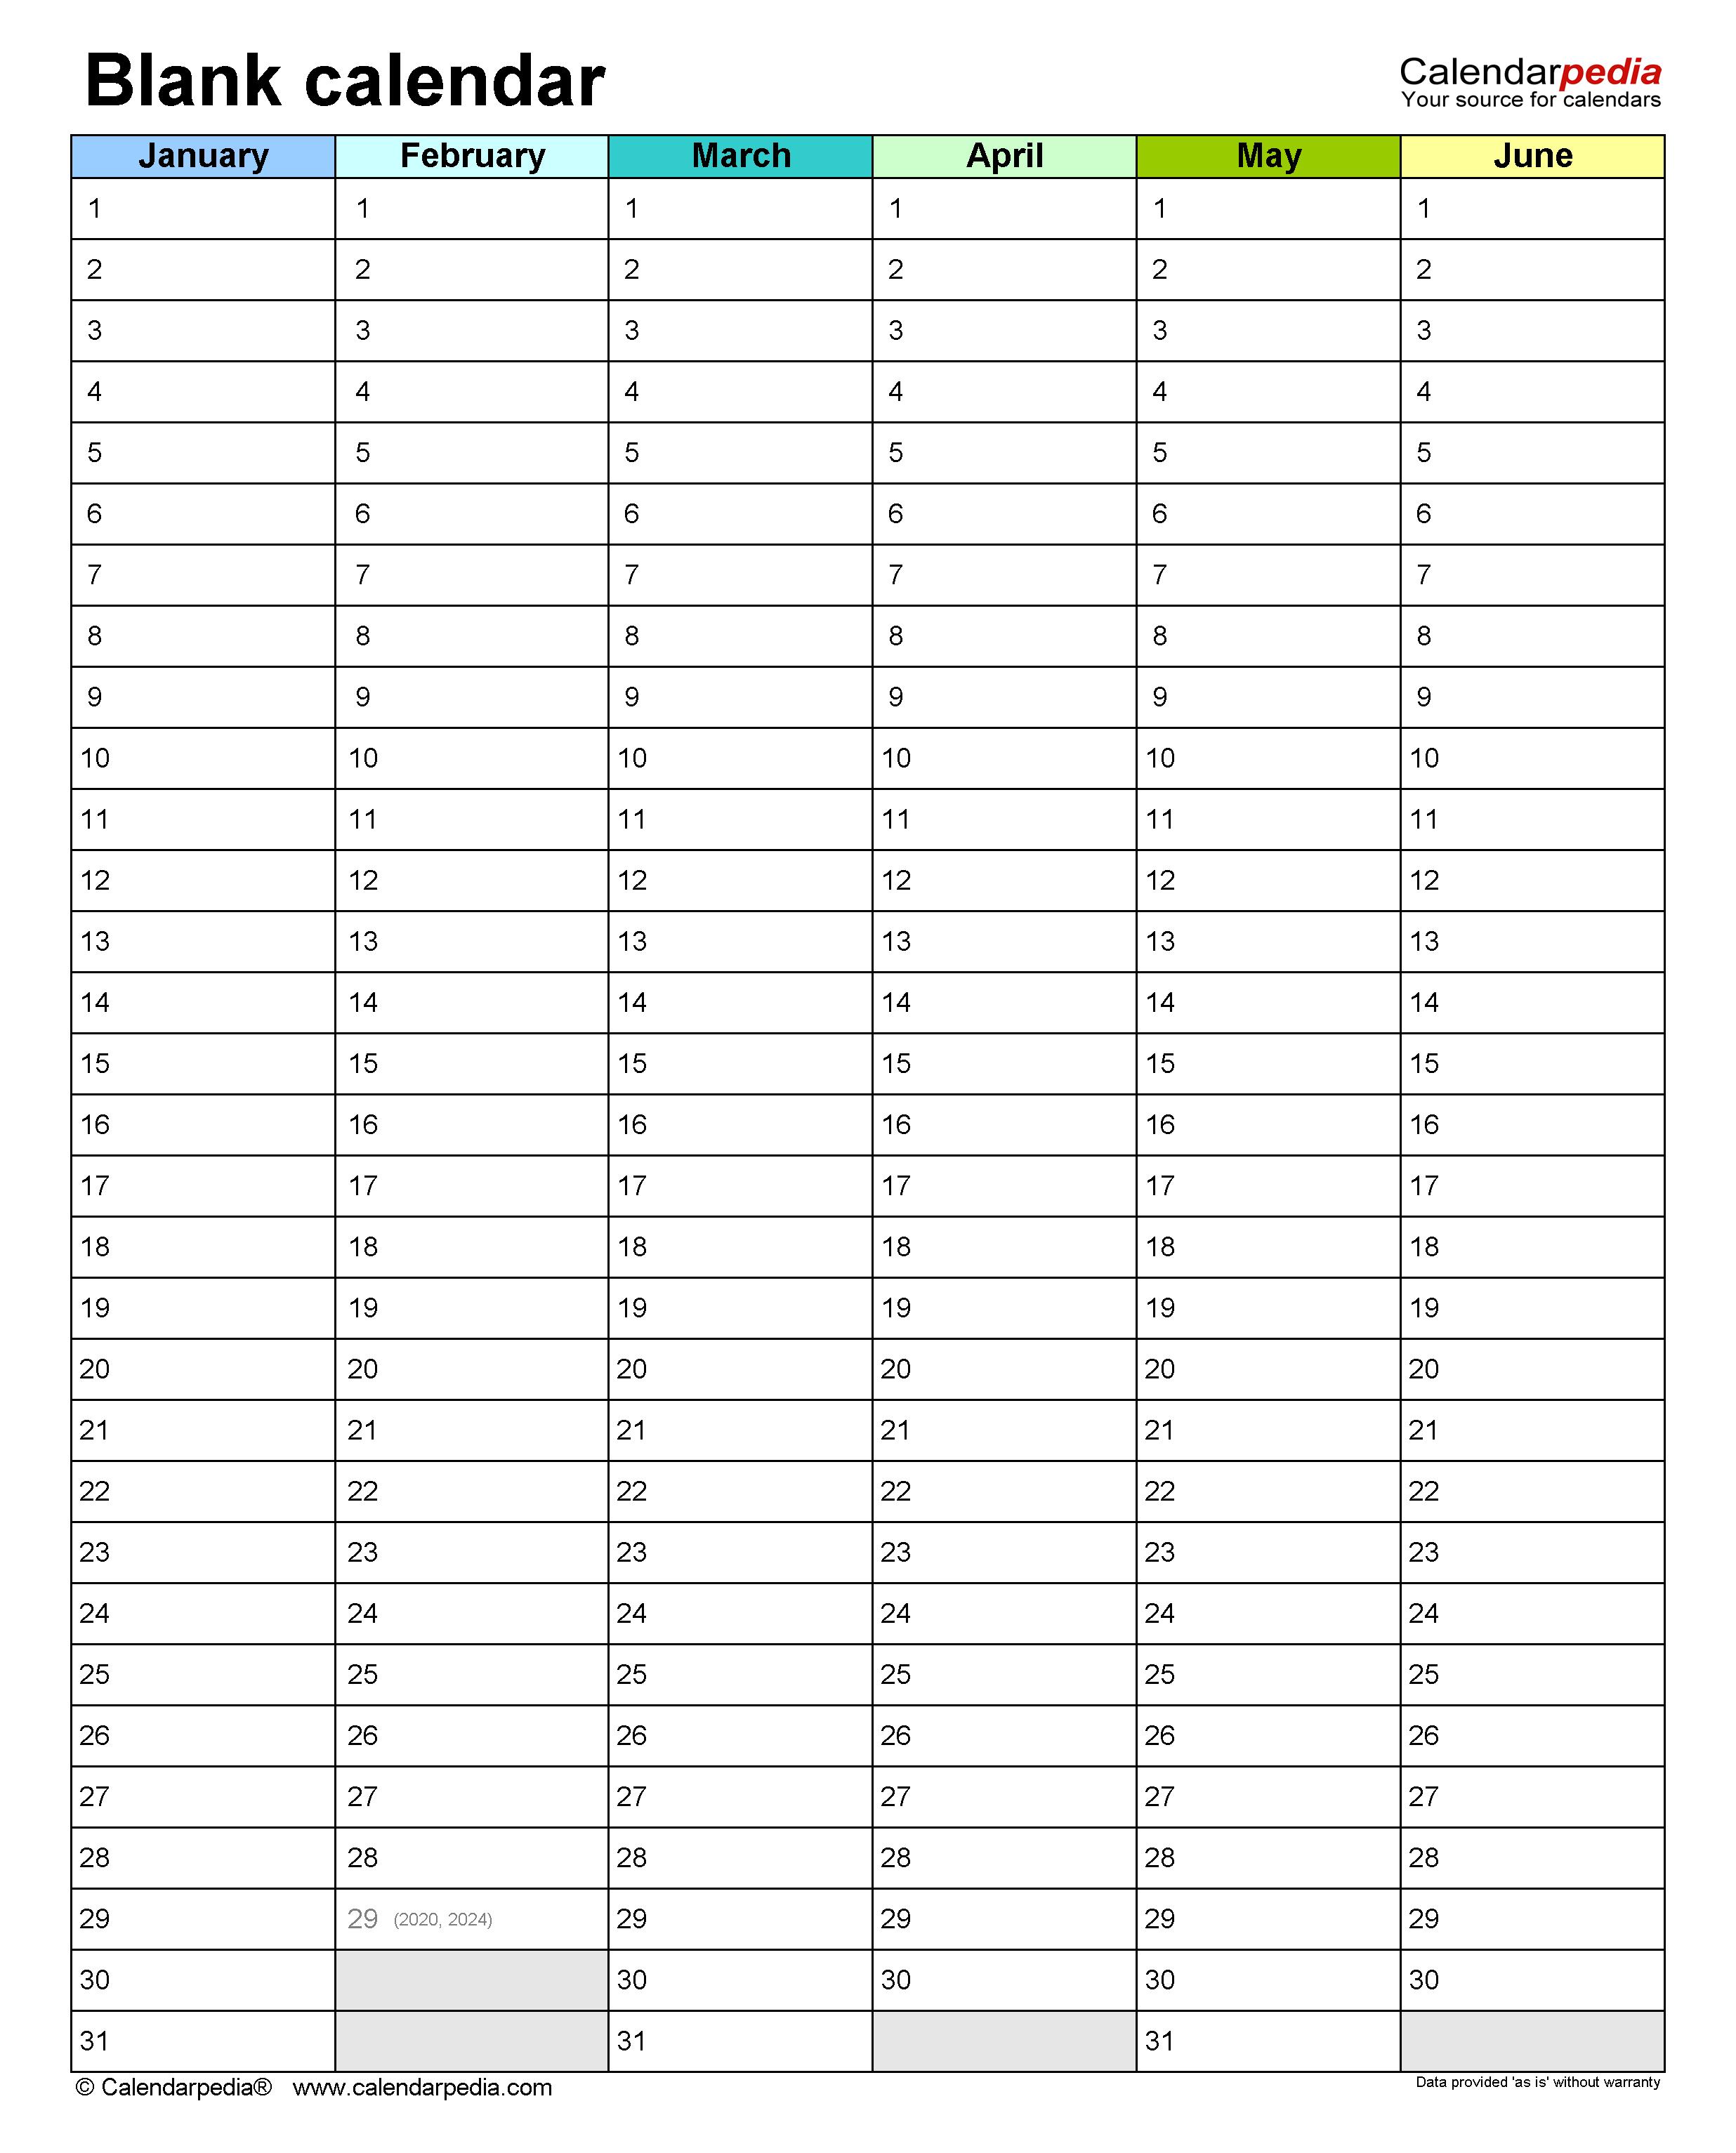 Calendar Template For Word from www.calendarpedia.com